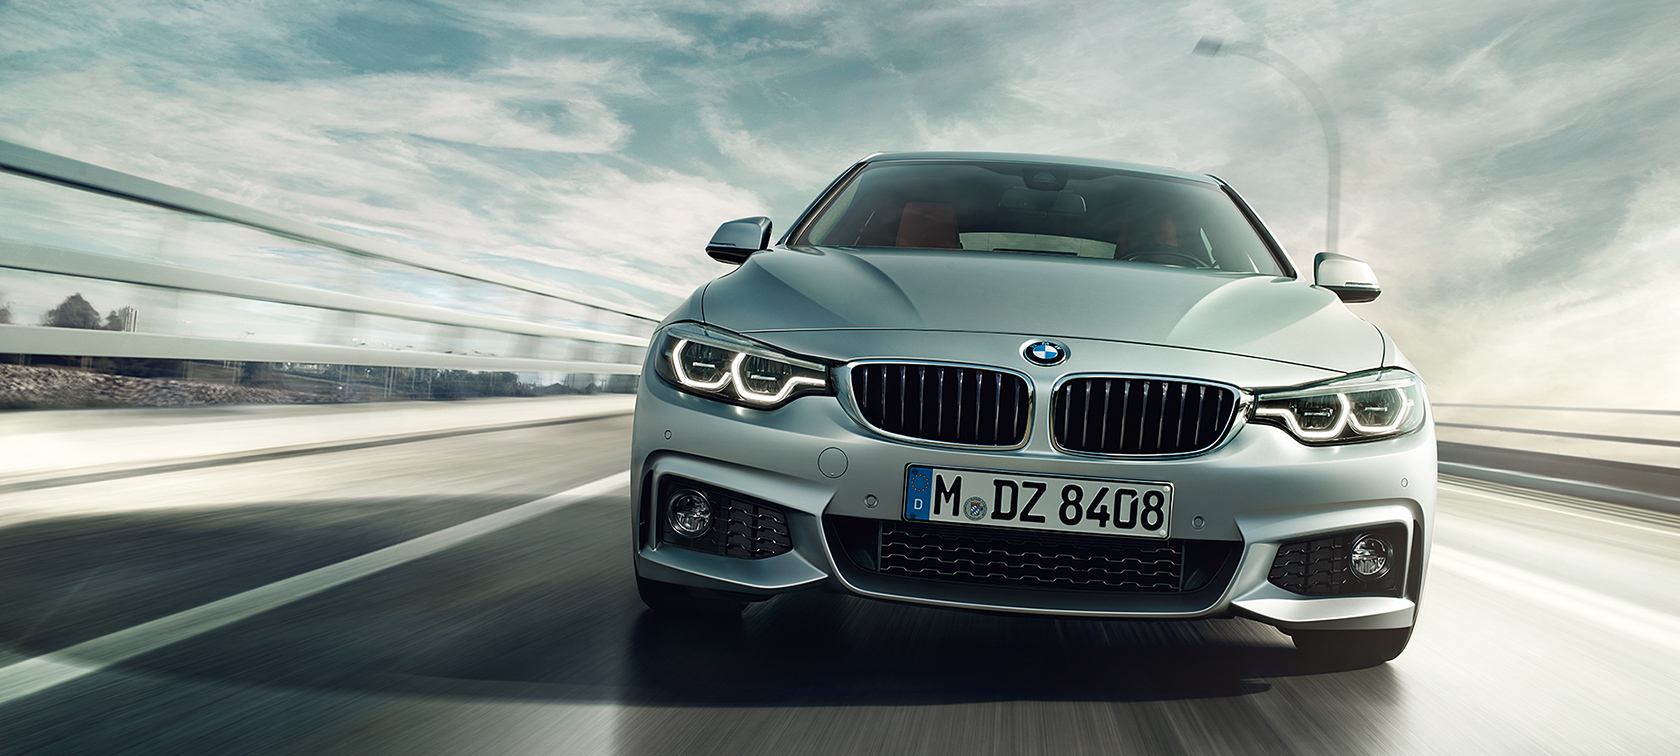 BMW-4-series-gran-coupe-at-a-glance-ts-desktop.jpg